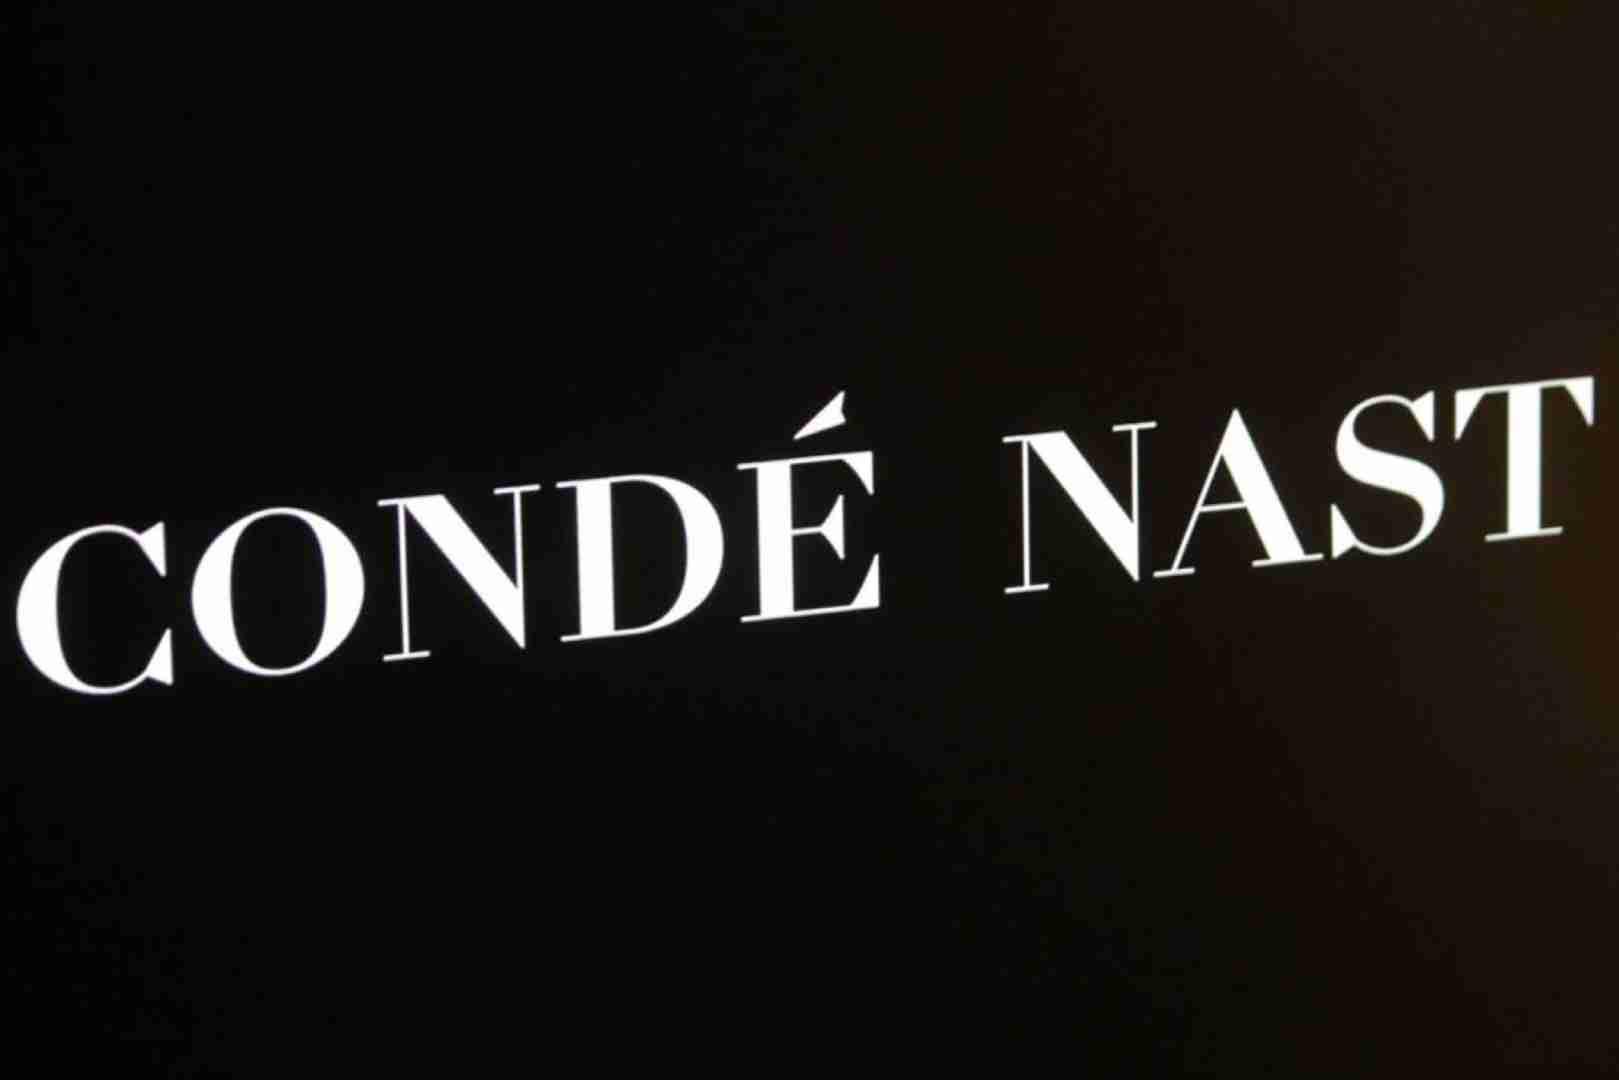 Cond é Nast向未付和未付实习生支付5.8万美元